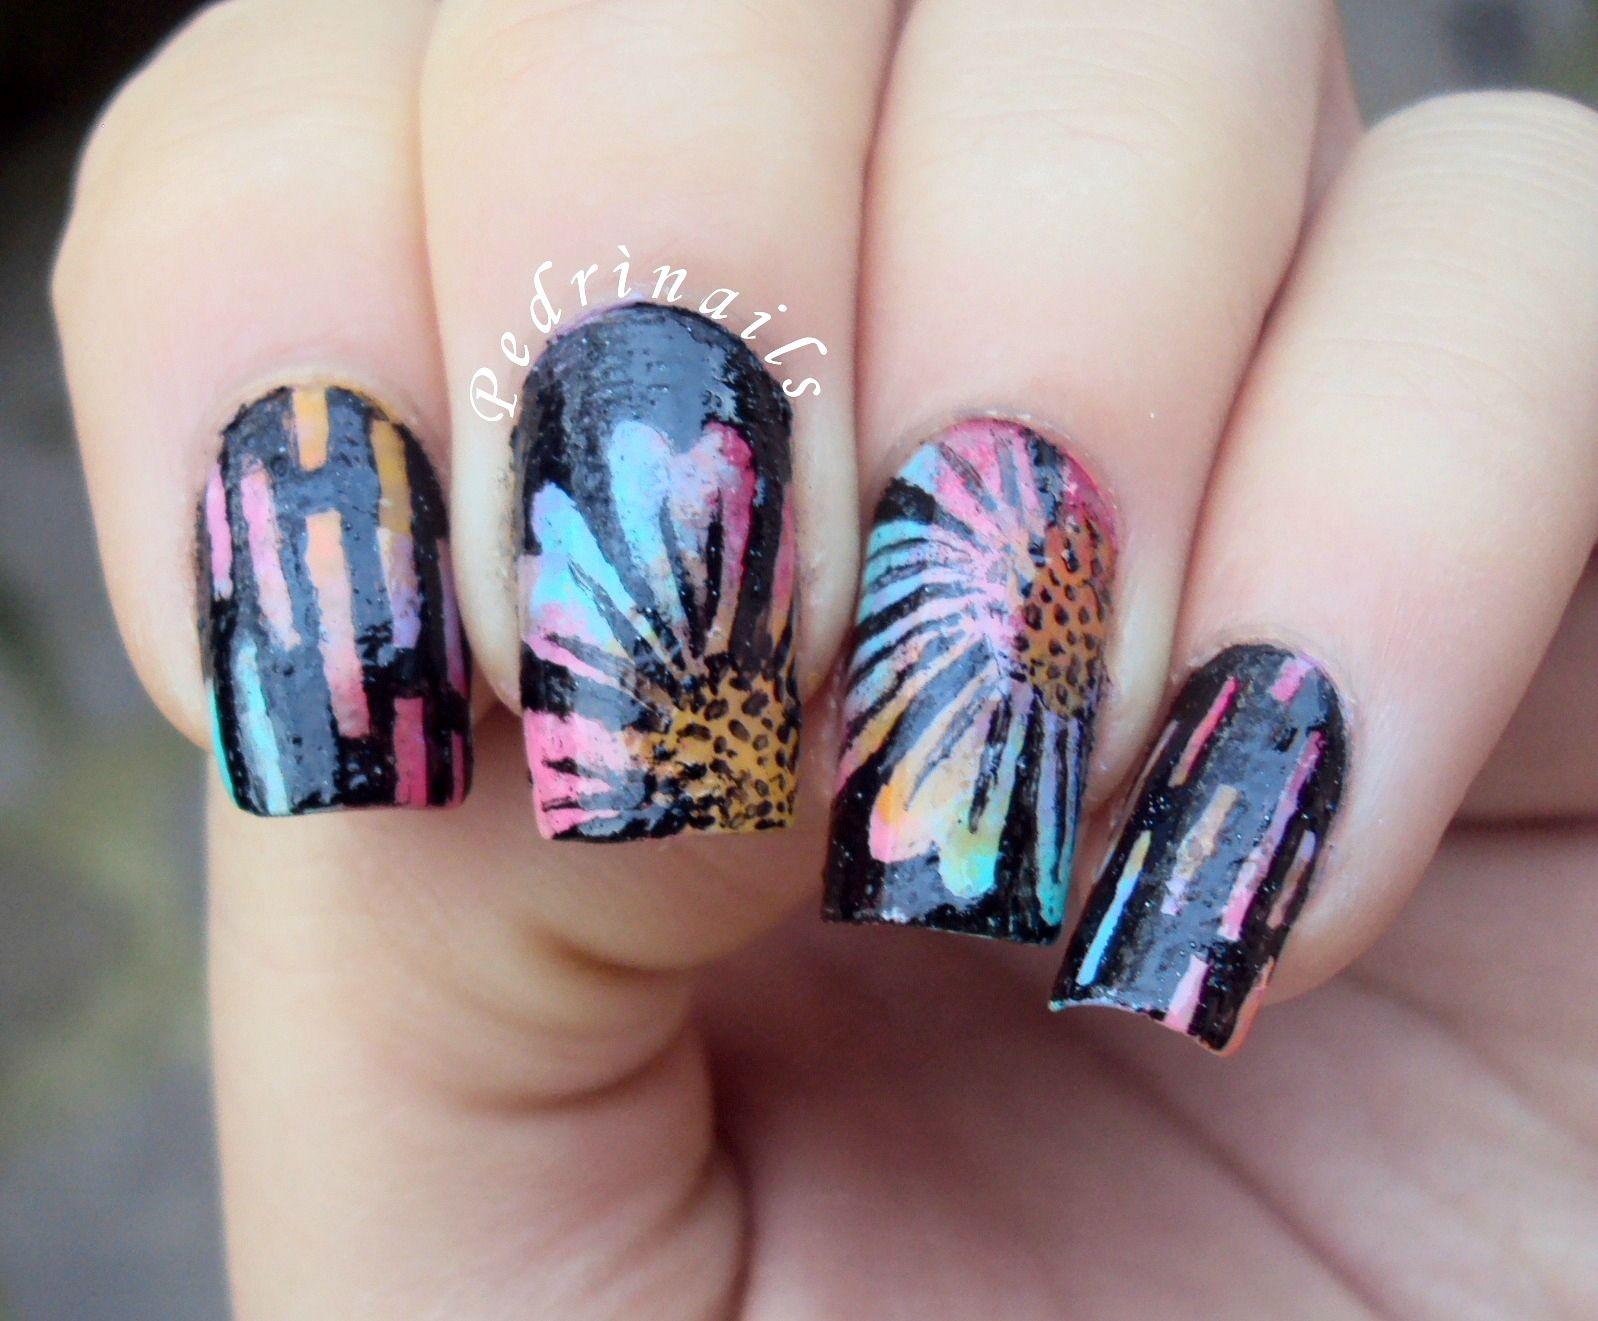 Skittlette multi colored floral pastels sponged manicure negative ...